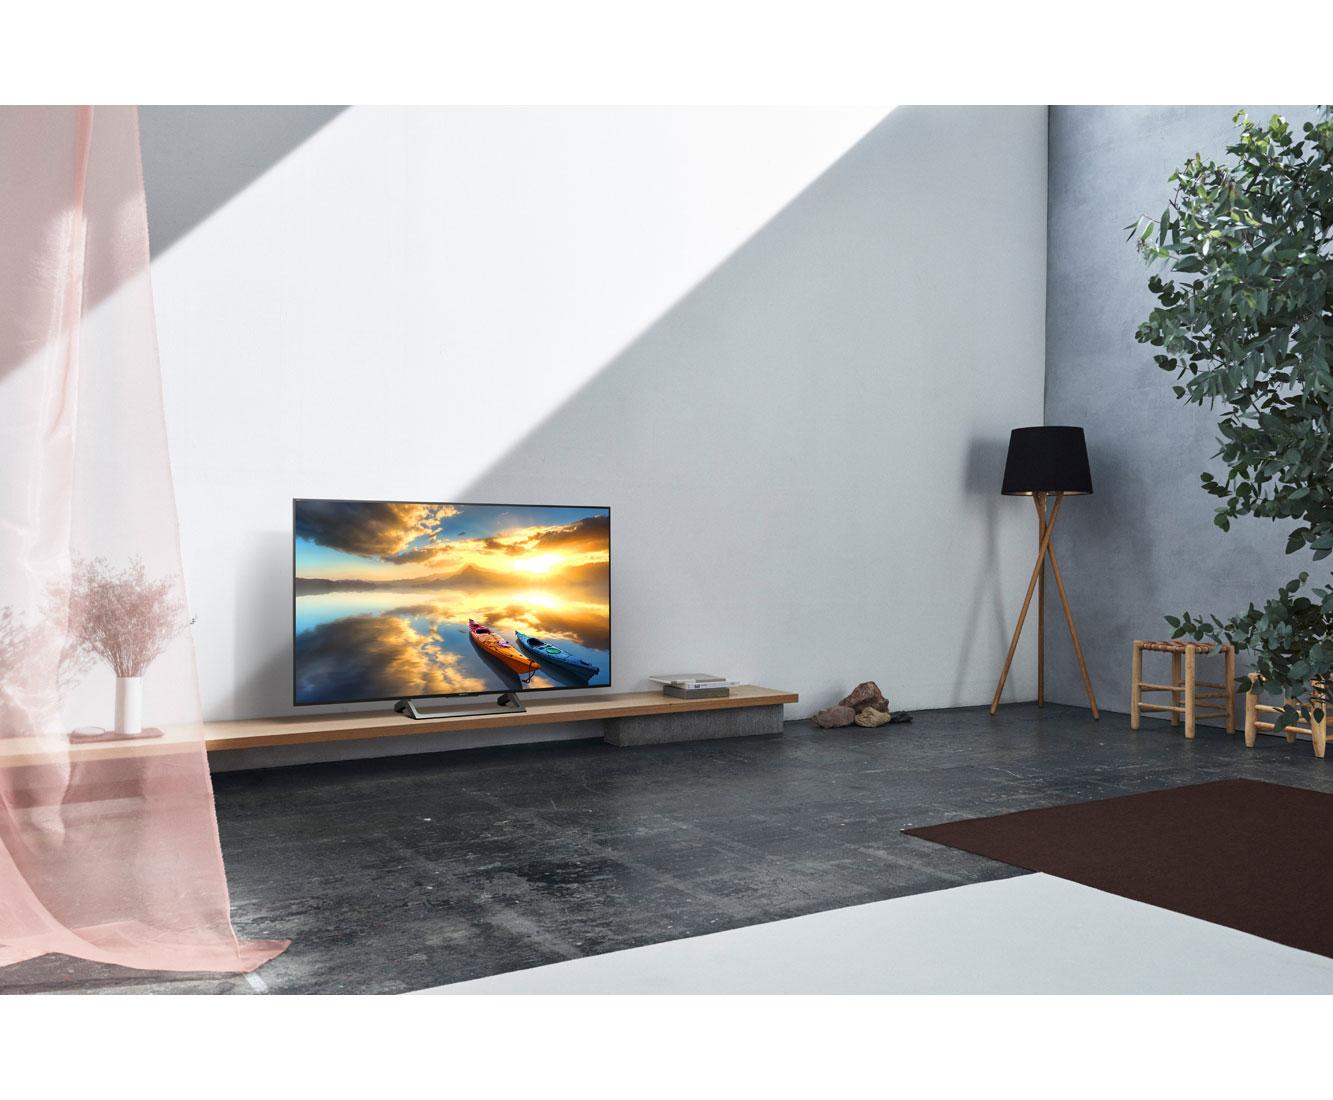 sony kd49xe7005baep 4k uhd led fernseher 123 cm 49 zoll. Black Bedroom Furniture Sets. Home Design Ideas